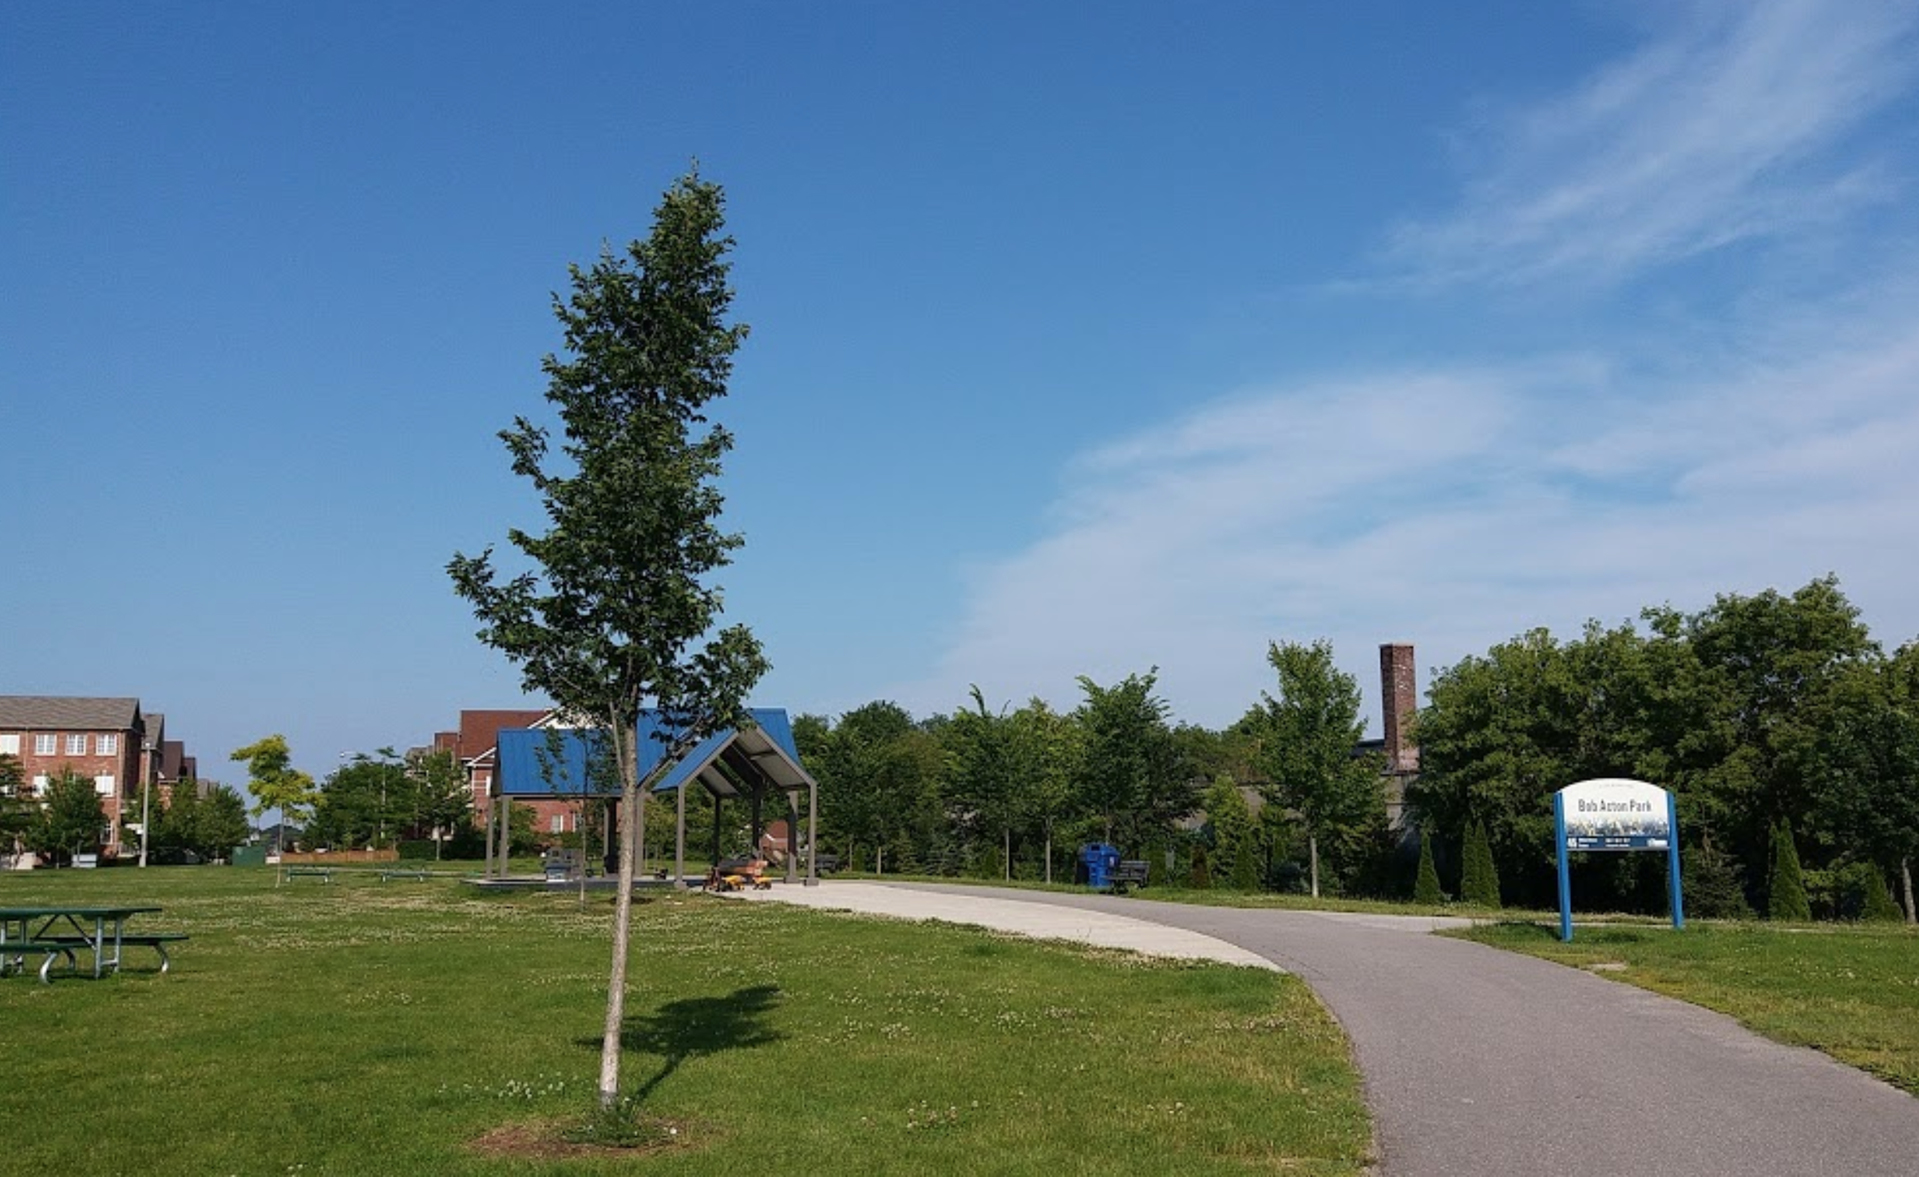 Bob Acton Park at 114 - 2320 Gerrard Street E, East End-Danforth, Toronto